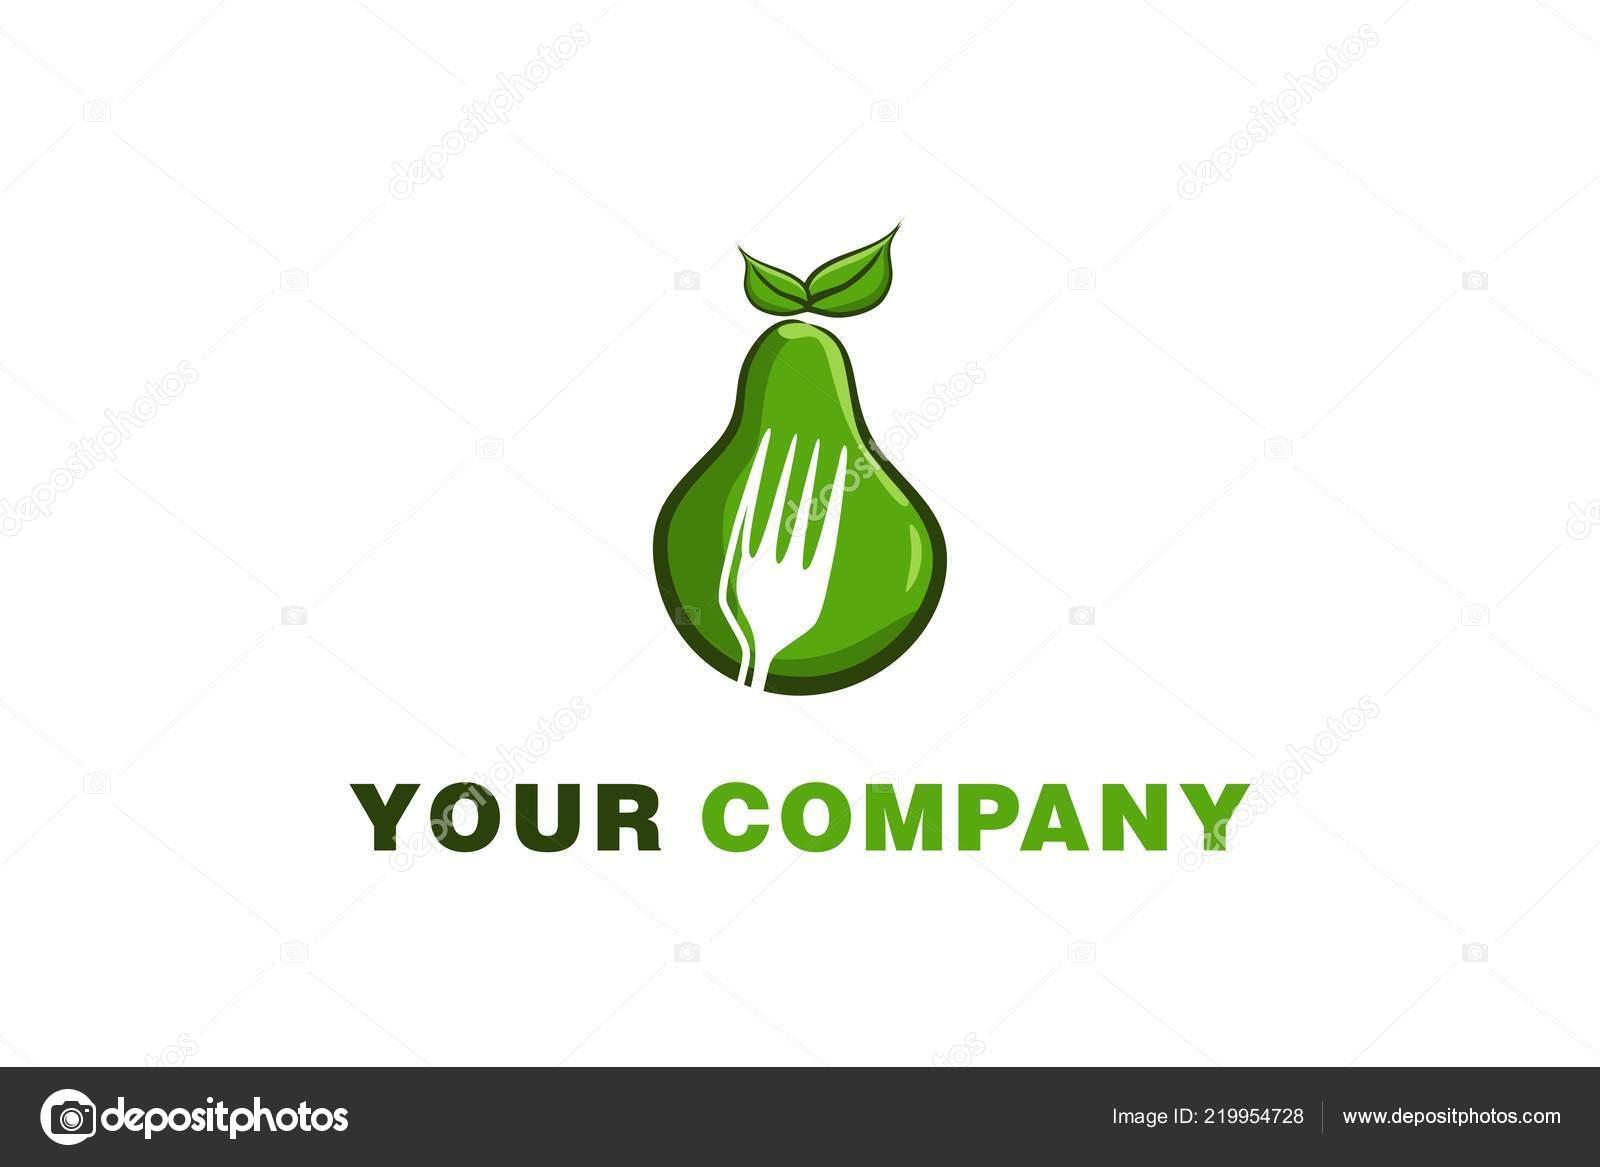 Green Avocado Negative Space Fork Logo Designs Inspiration